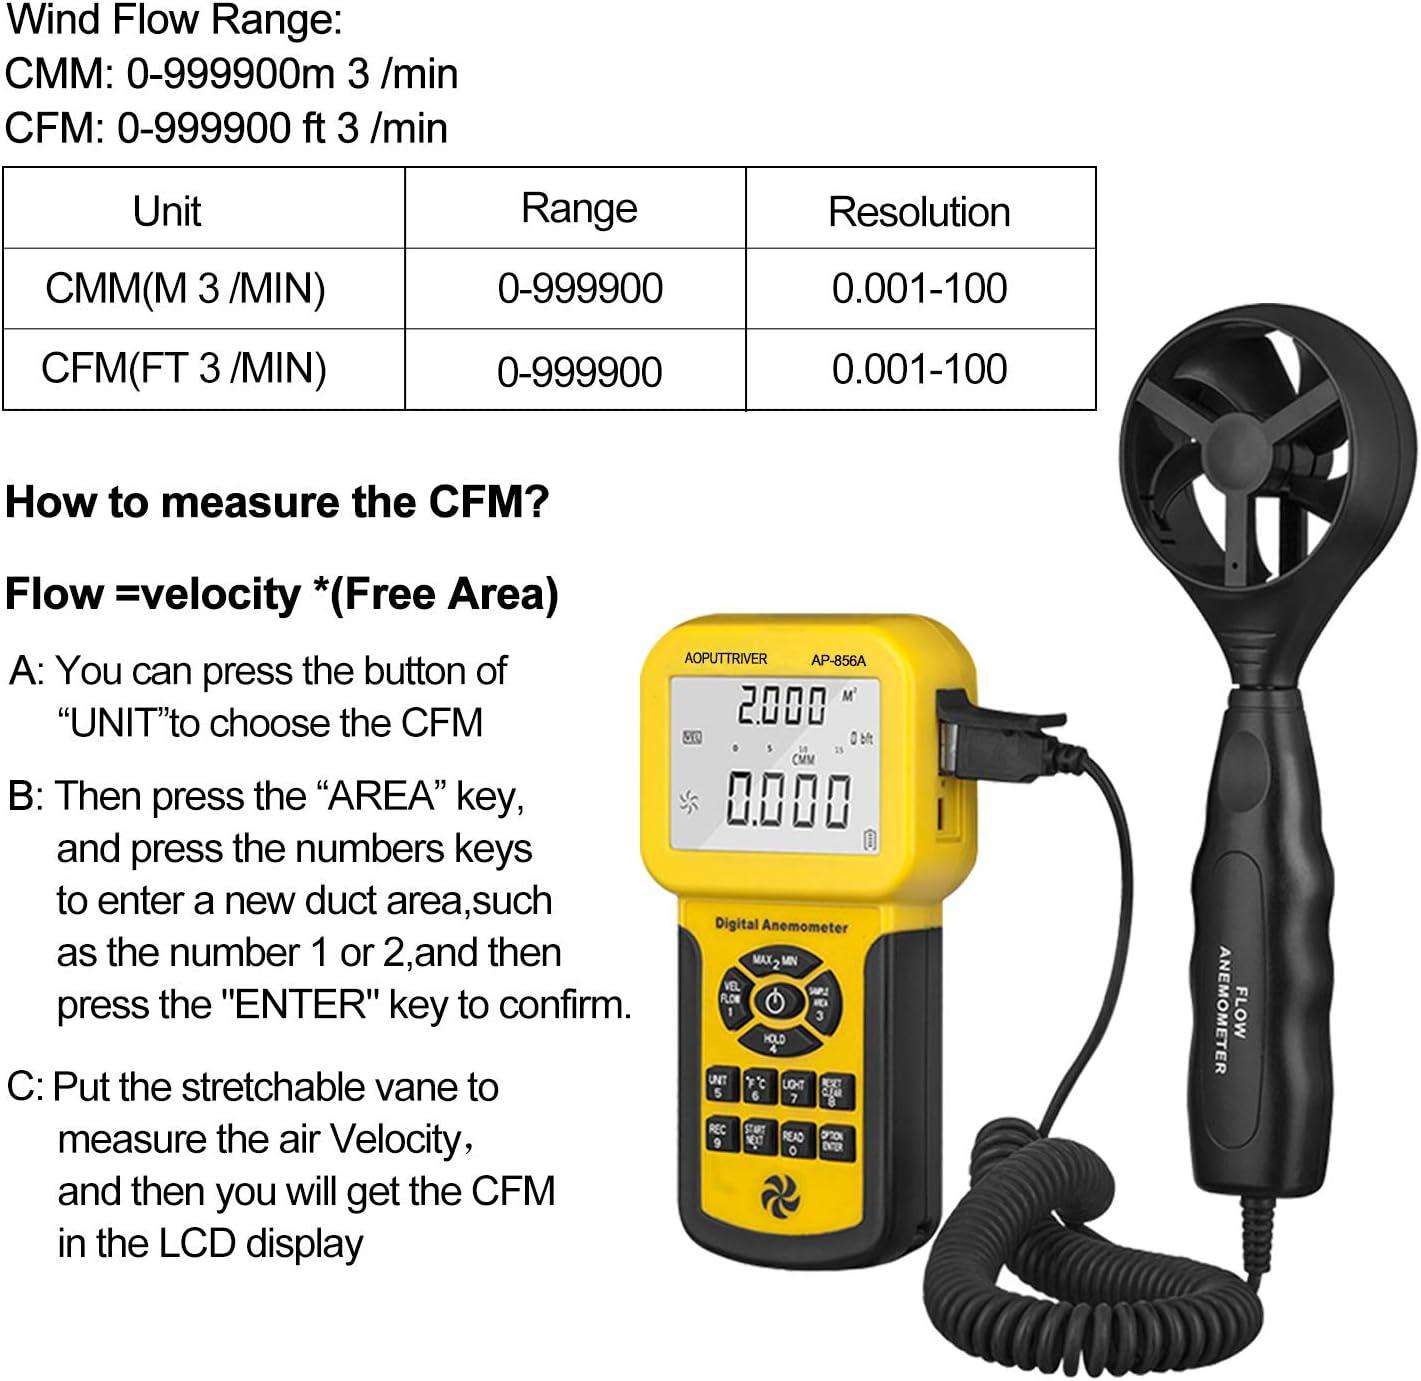 Barometric Pressure measure for HVAC CFM Shooting Altitude Digital Anemometer Barometer AP-007WM Handheld Anemometer Wind Speed Meter for Wind Speed//Temperature with Wind Chill /& Relative Humidity